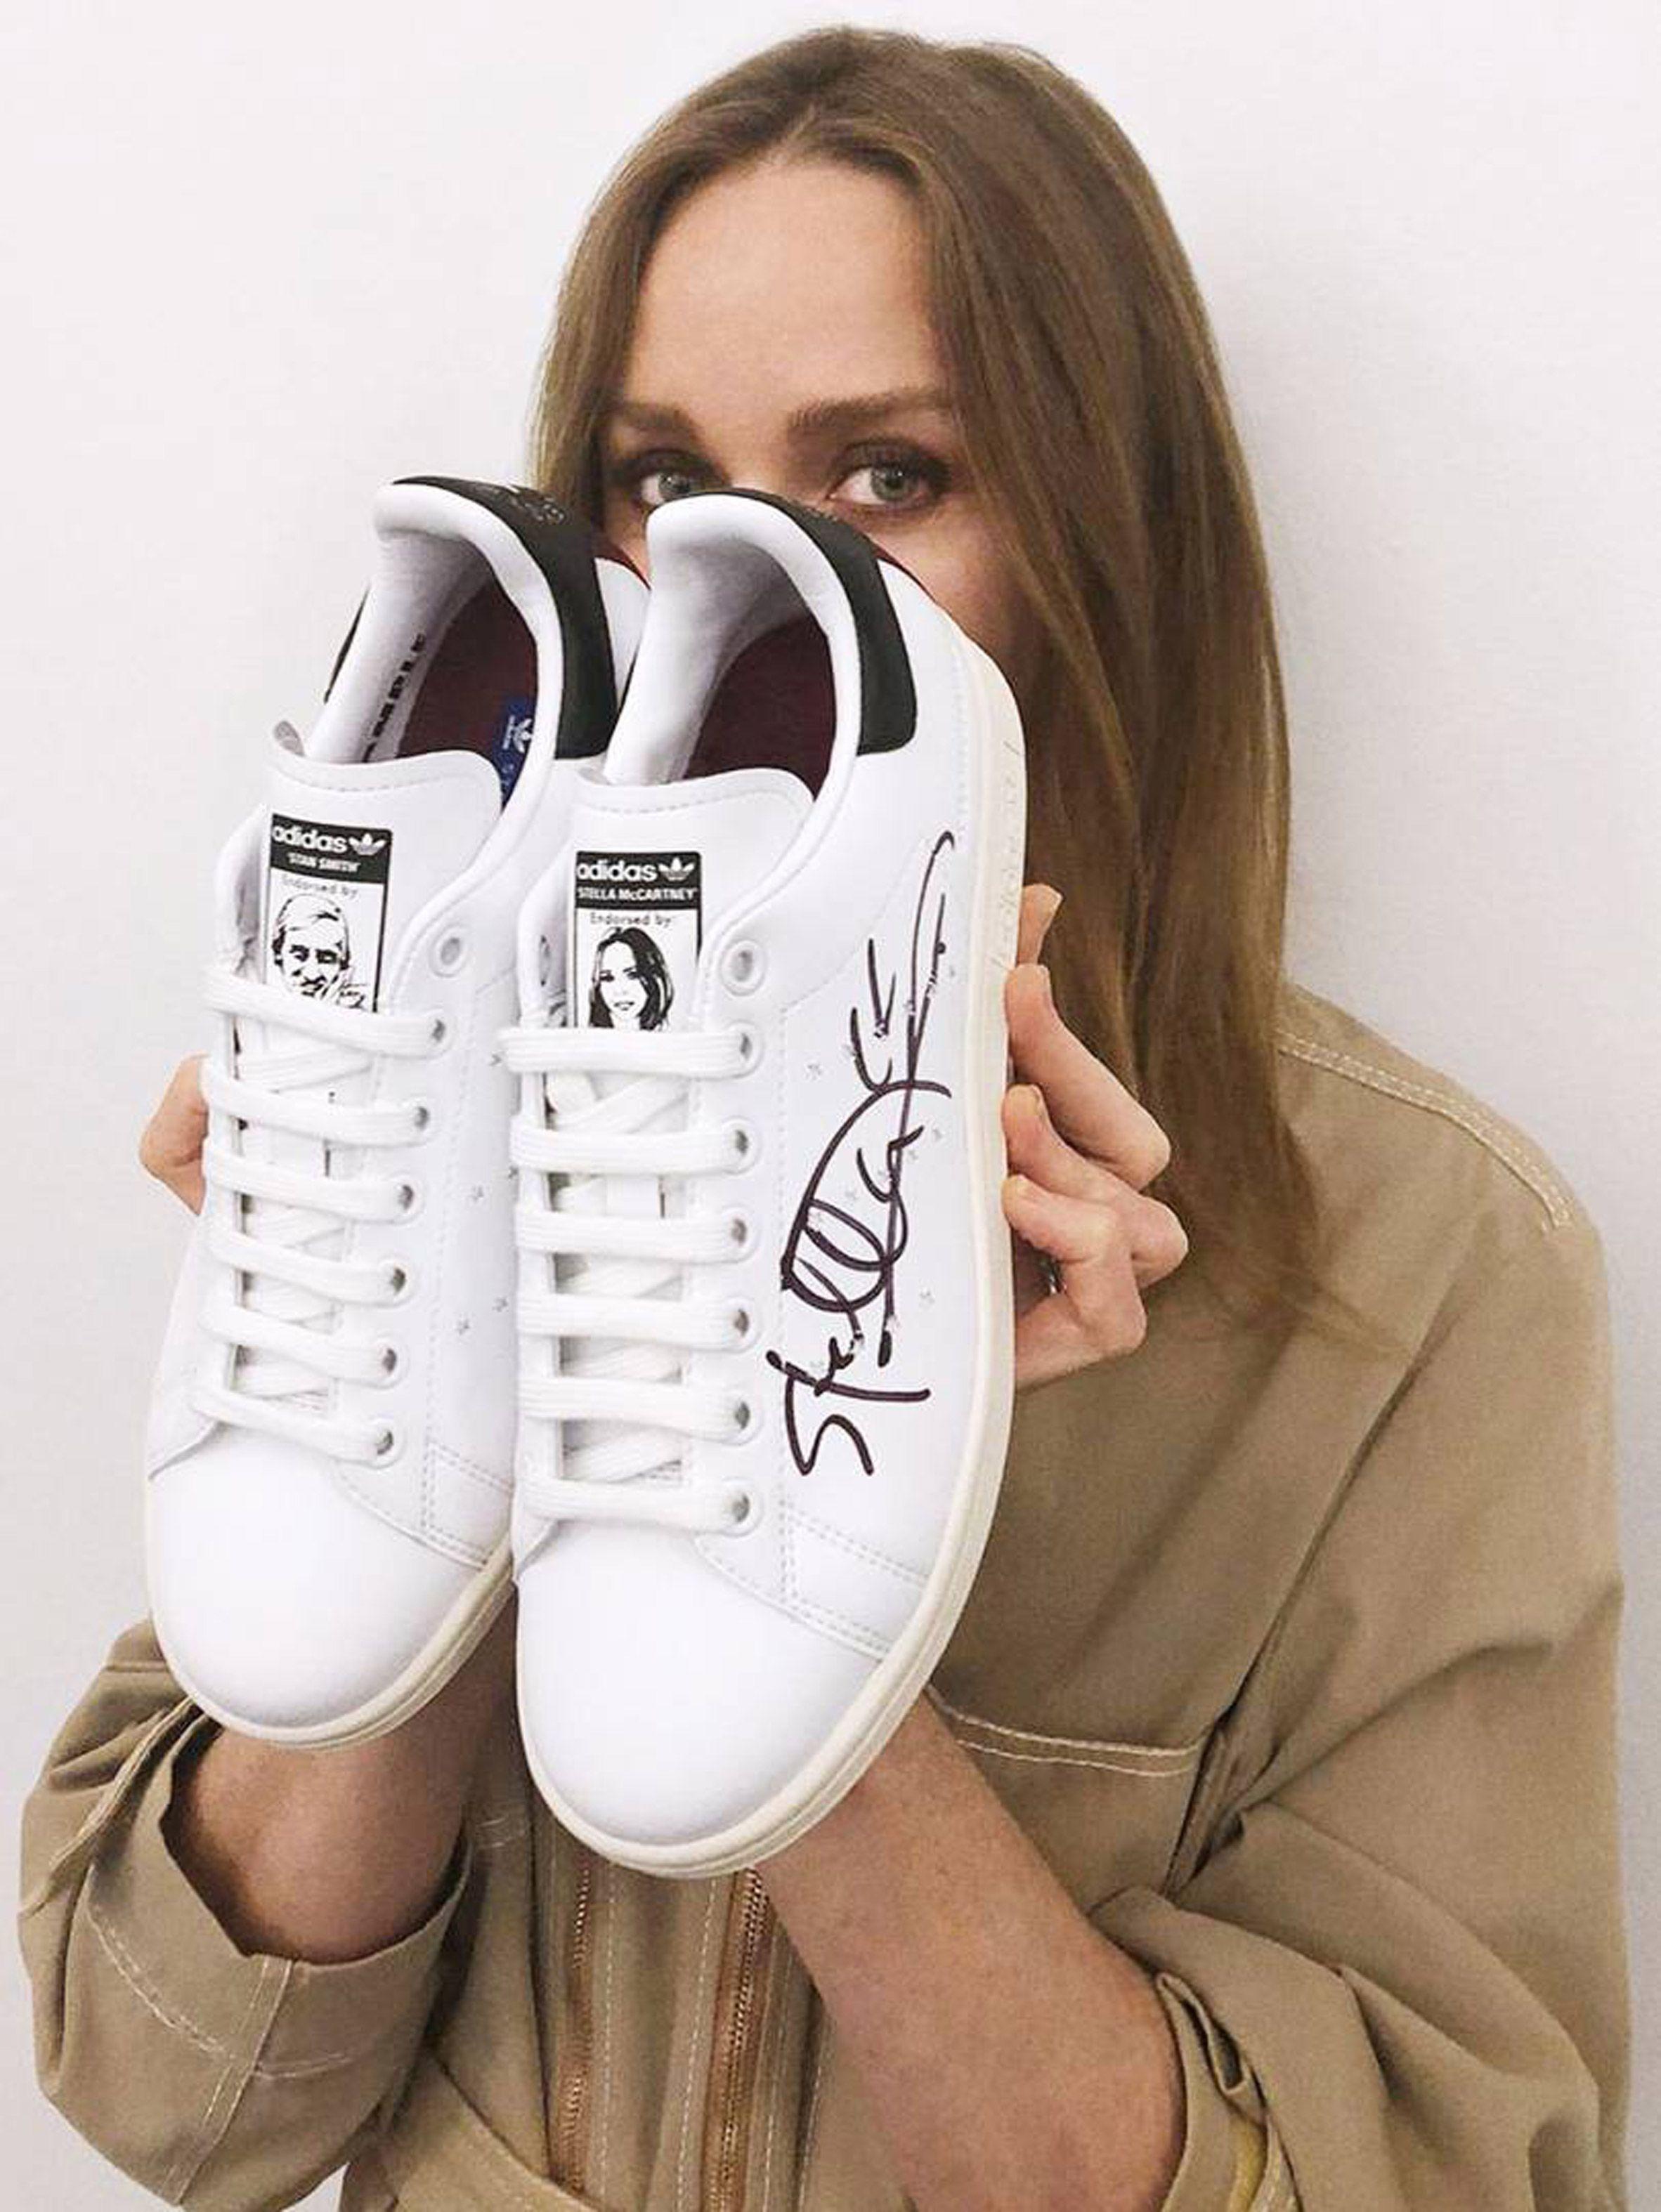 ea3bdae706ae Stella McCartney and Adidas launch vegan Stan Smiths